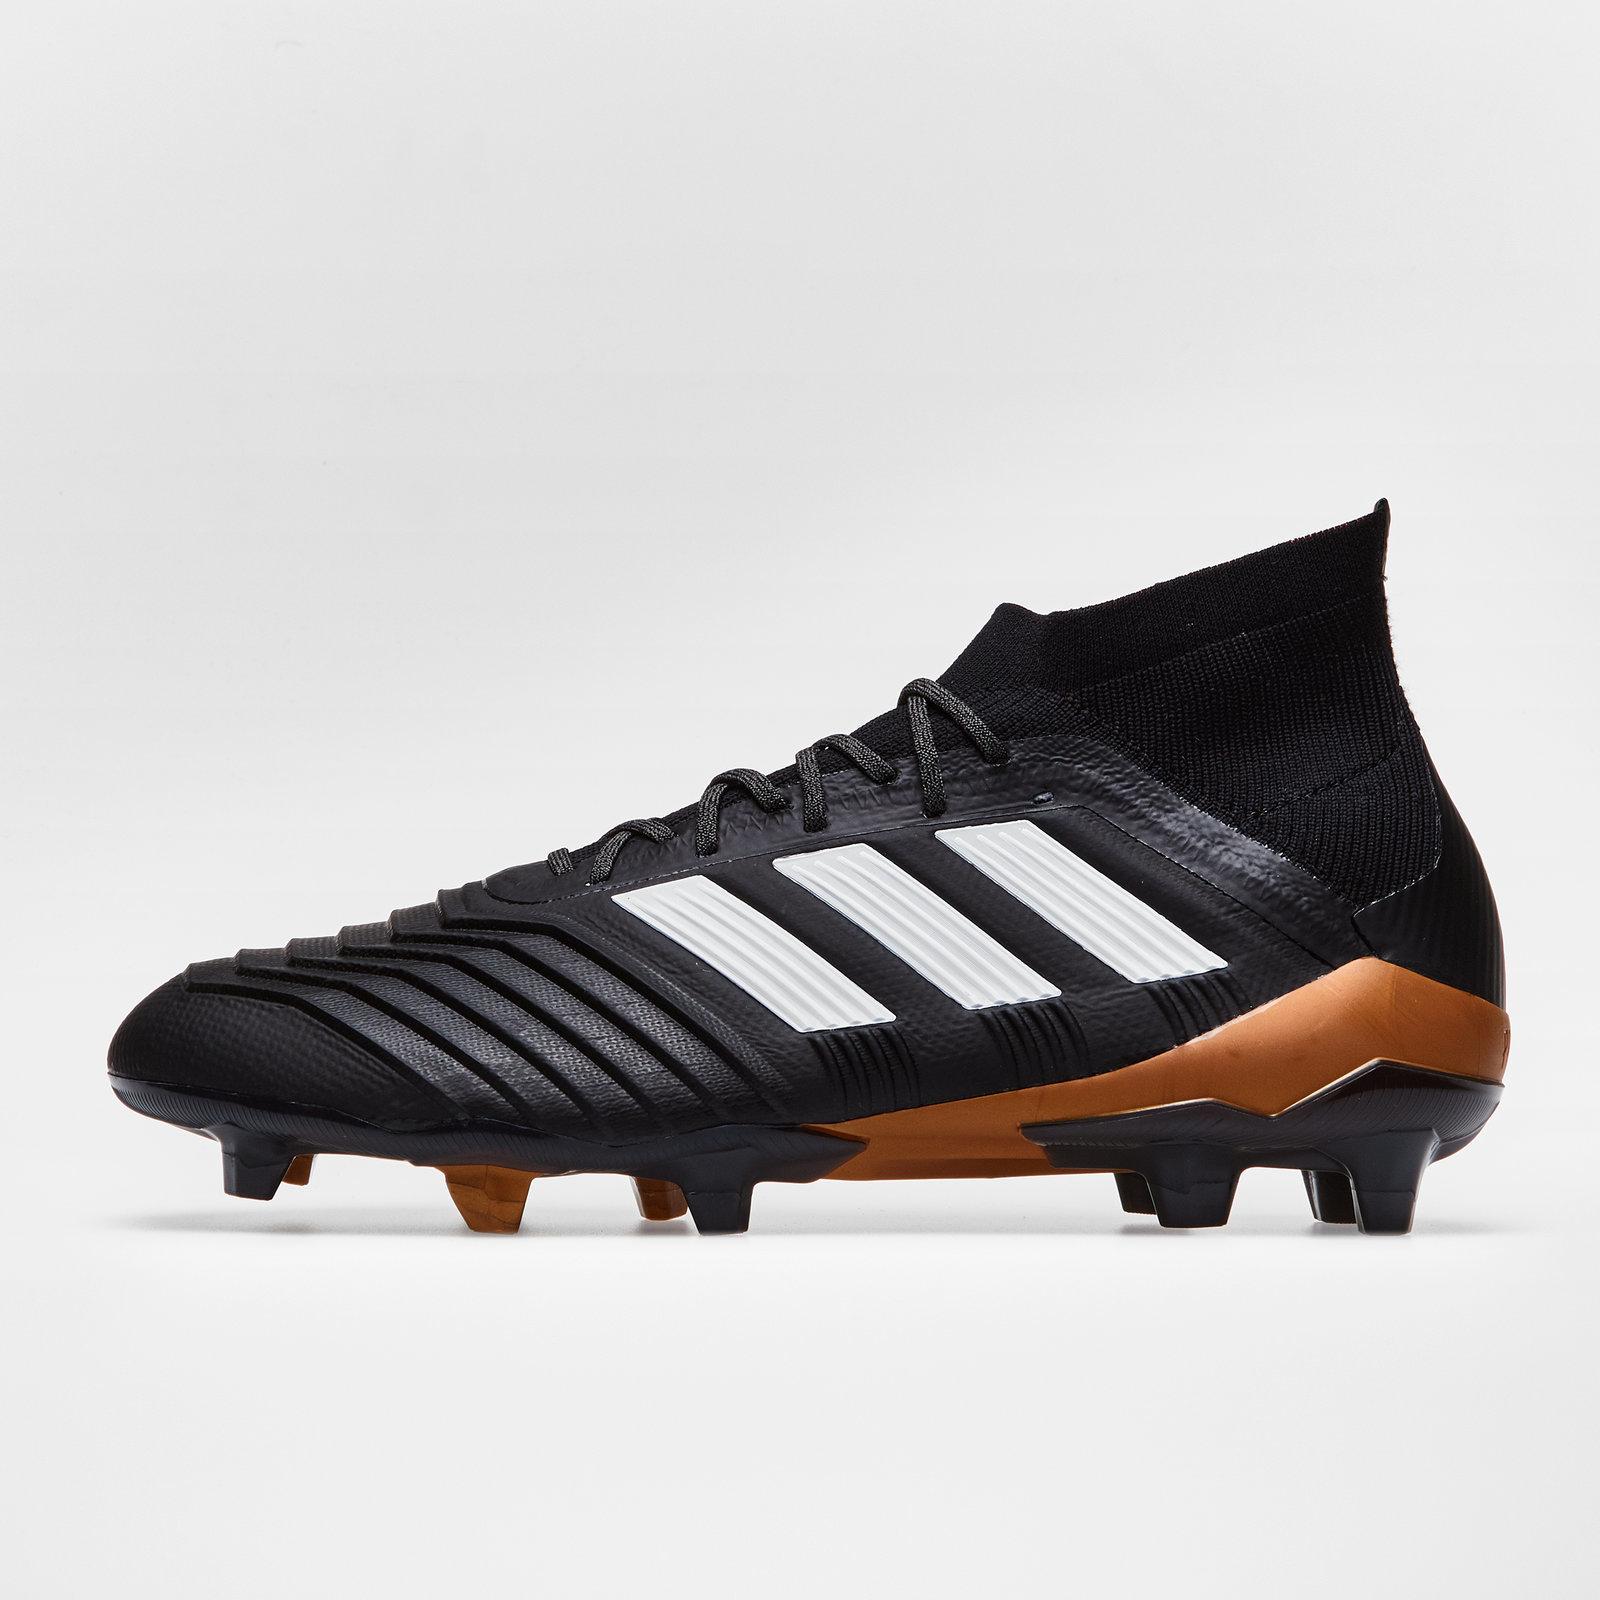 more photos b0783 fd1cf adidas Mens Predator 18.1 FG Football Boots Sports Studs Trainers Shoes